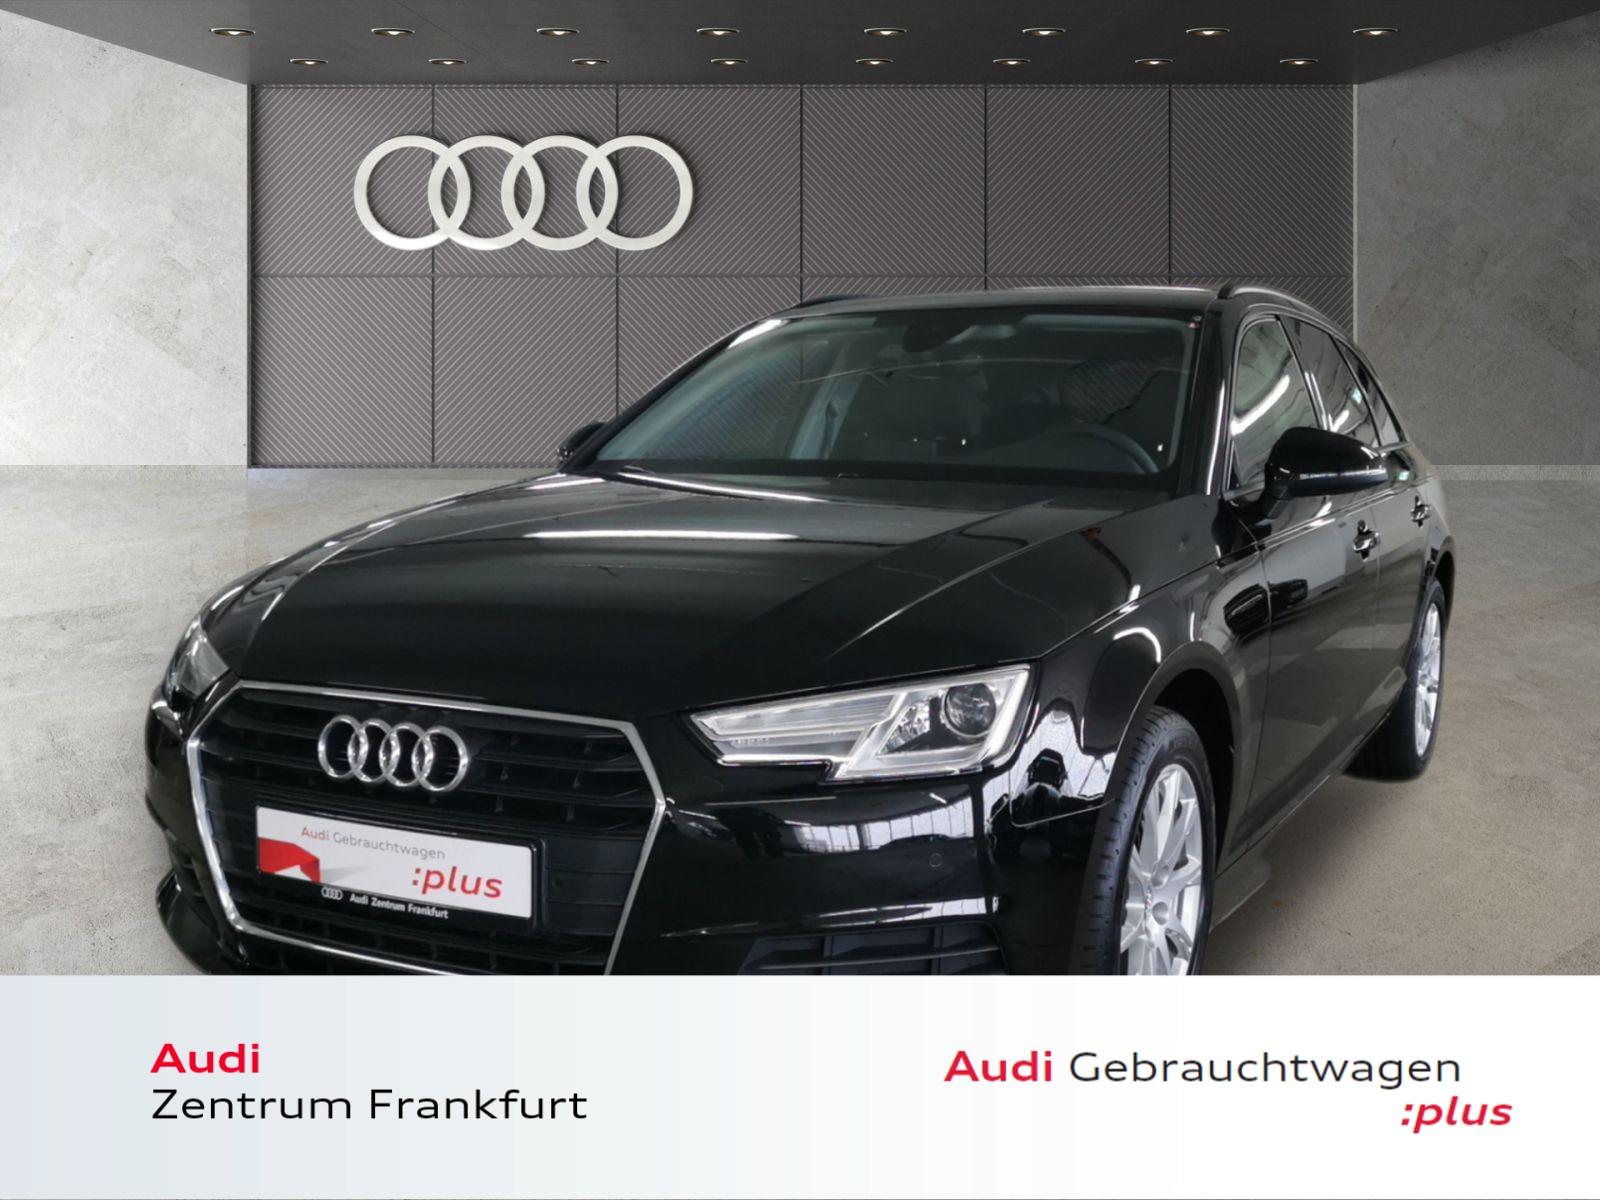 Audi A4 Avant 1.4 TFSI Xenon Navi PDC Tempomat Sitzheizung Klima, Jahr 2018, Benzin